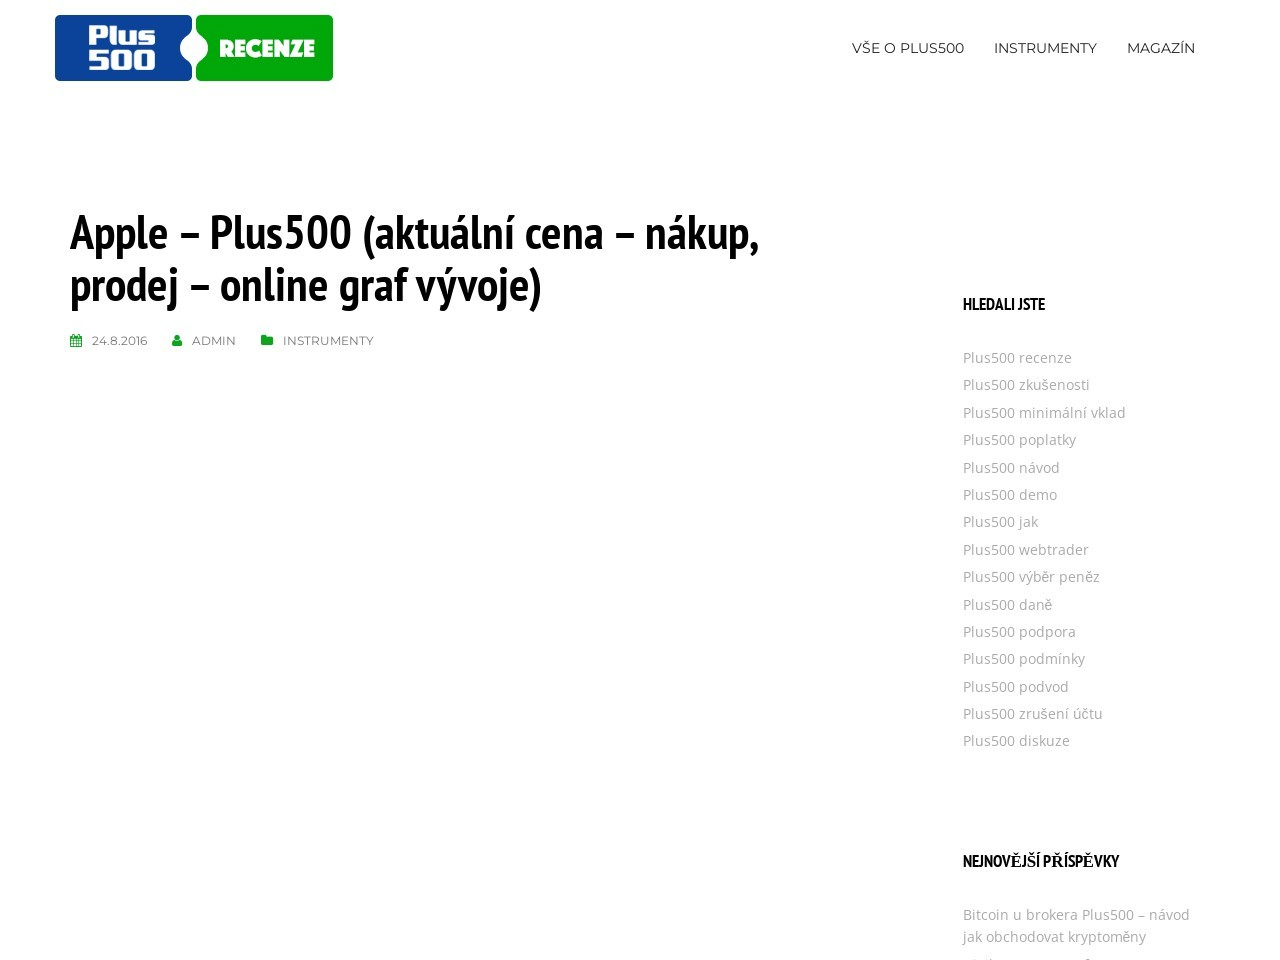 Apple – Plus500 (aktuální cena – nákup, prodej – online graf vývoje) (Zdroj: Wordpress.com)